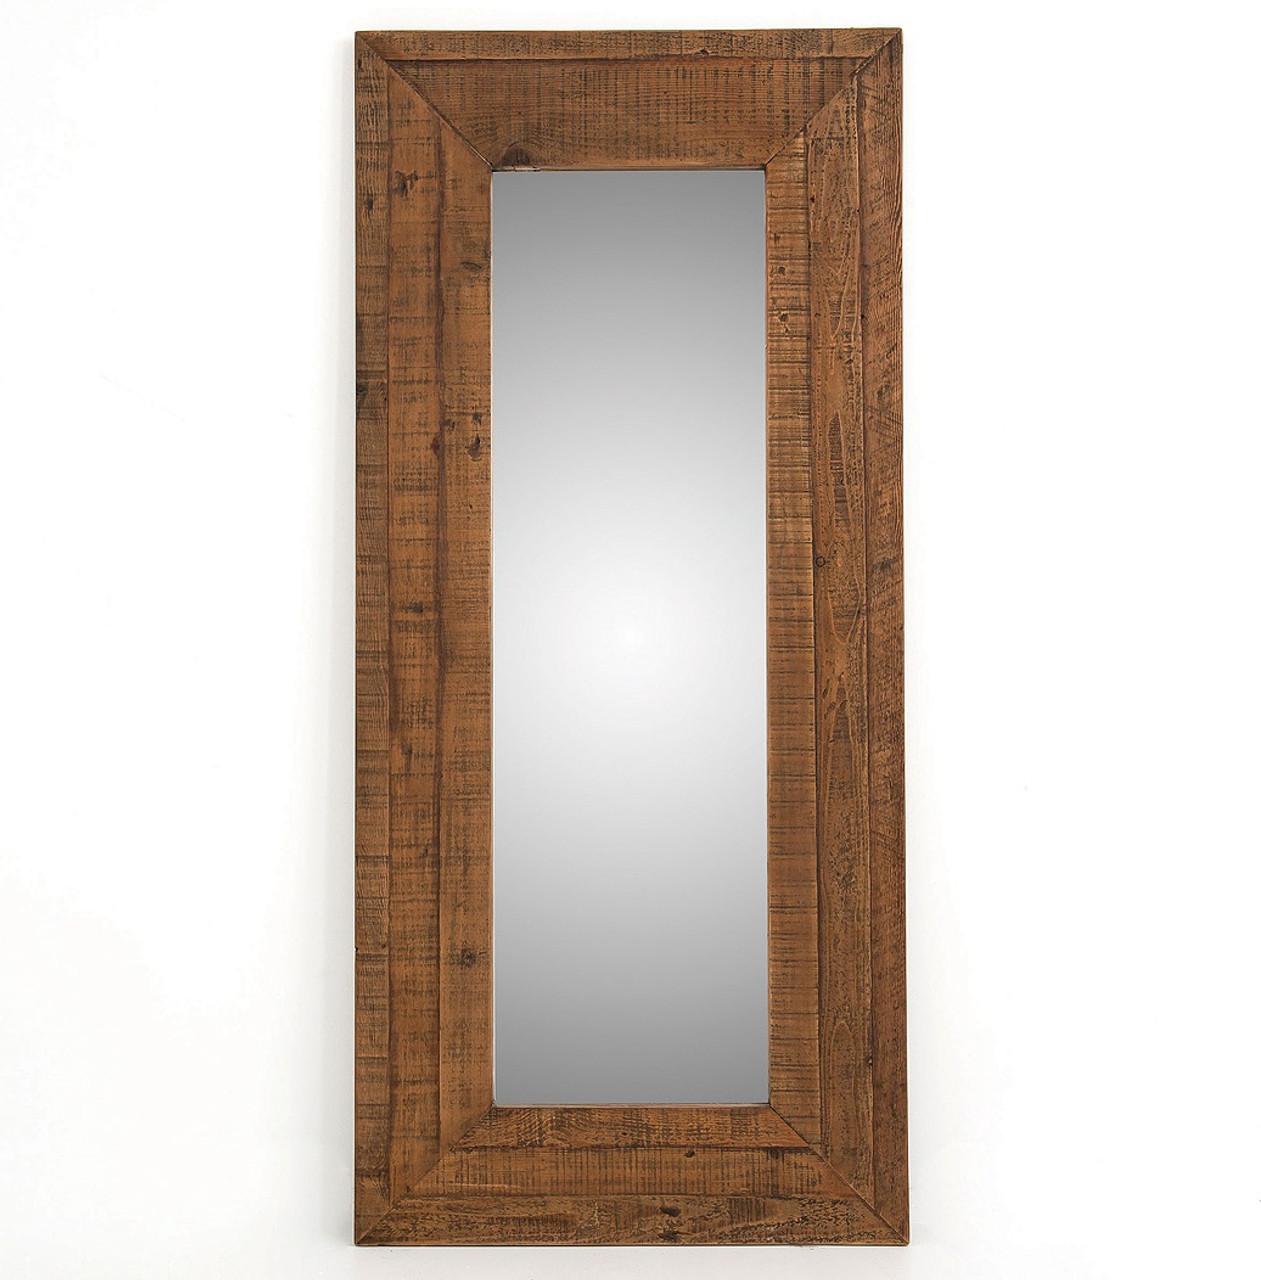 Farmhouse Rustic Reclaimed Wood Large Floor Mirror | Zin Home